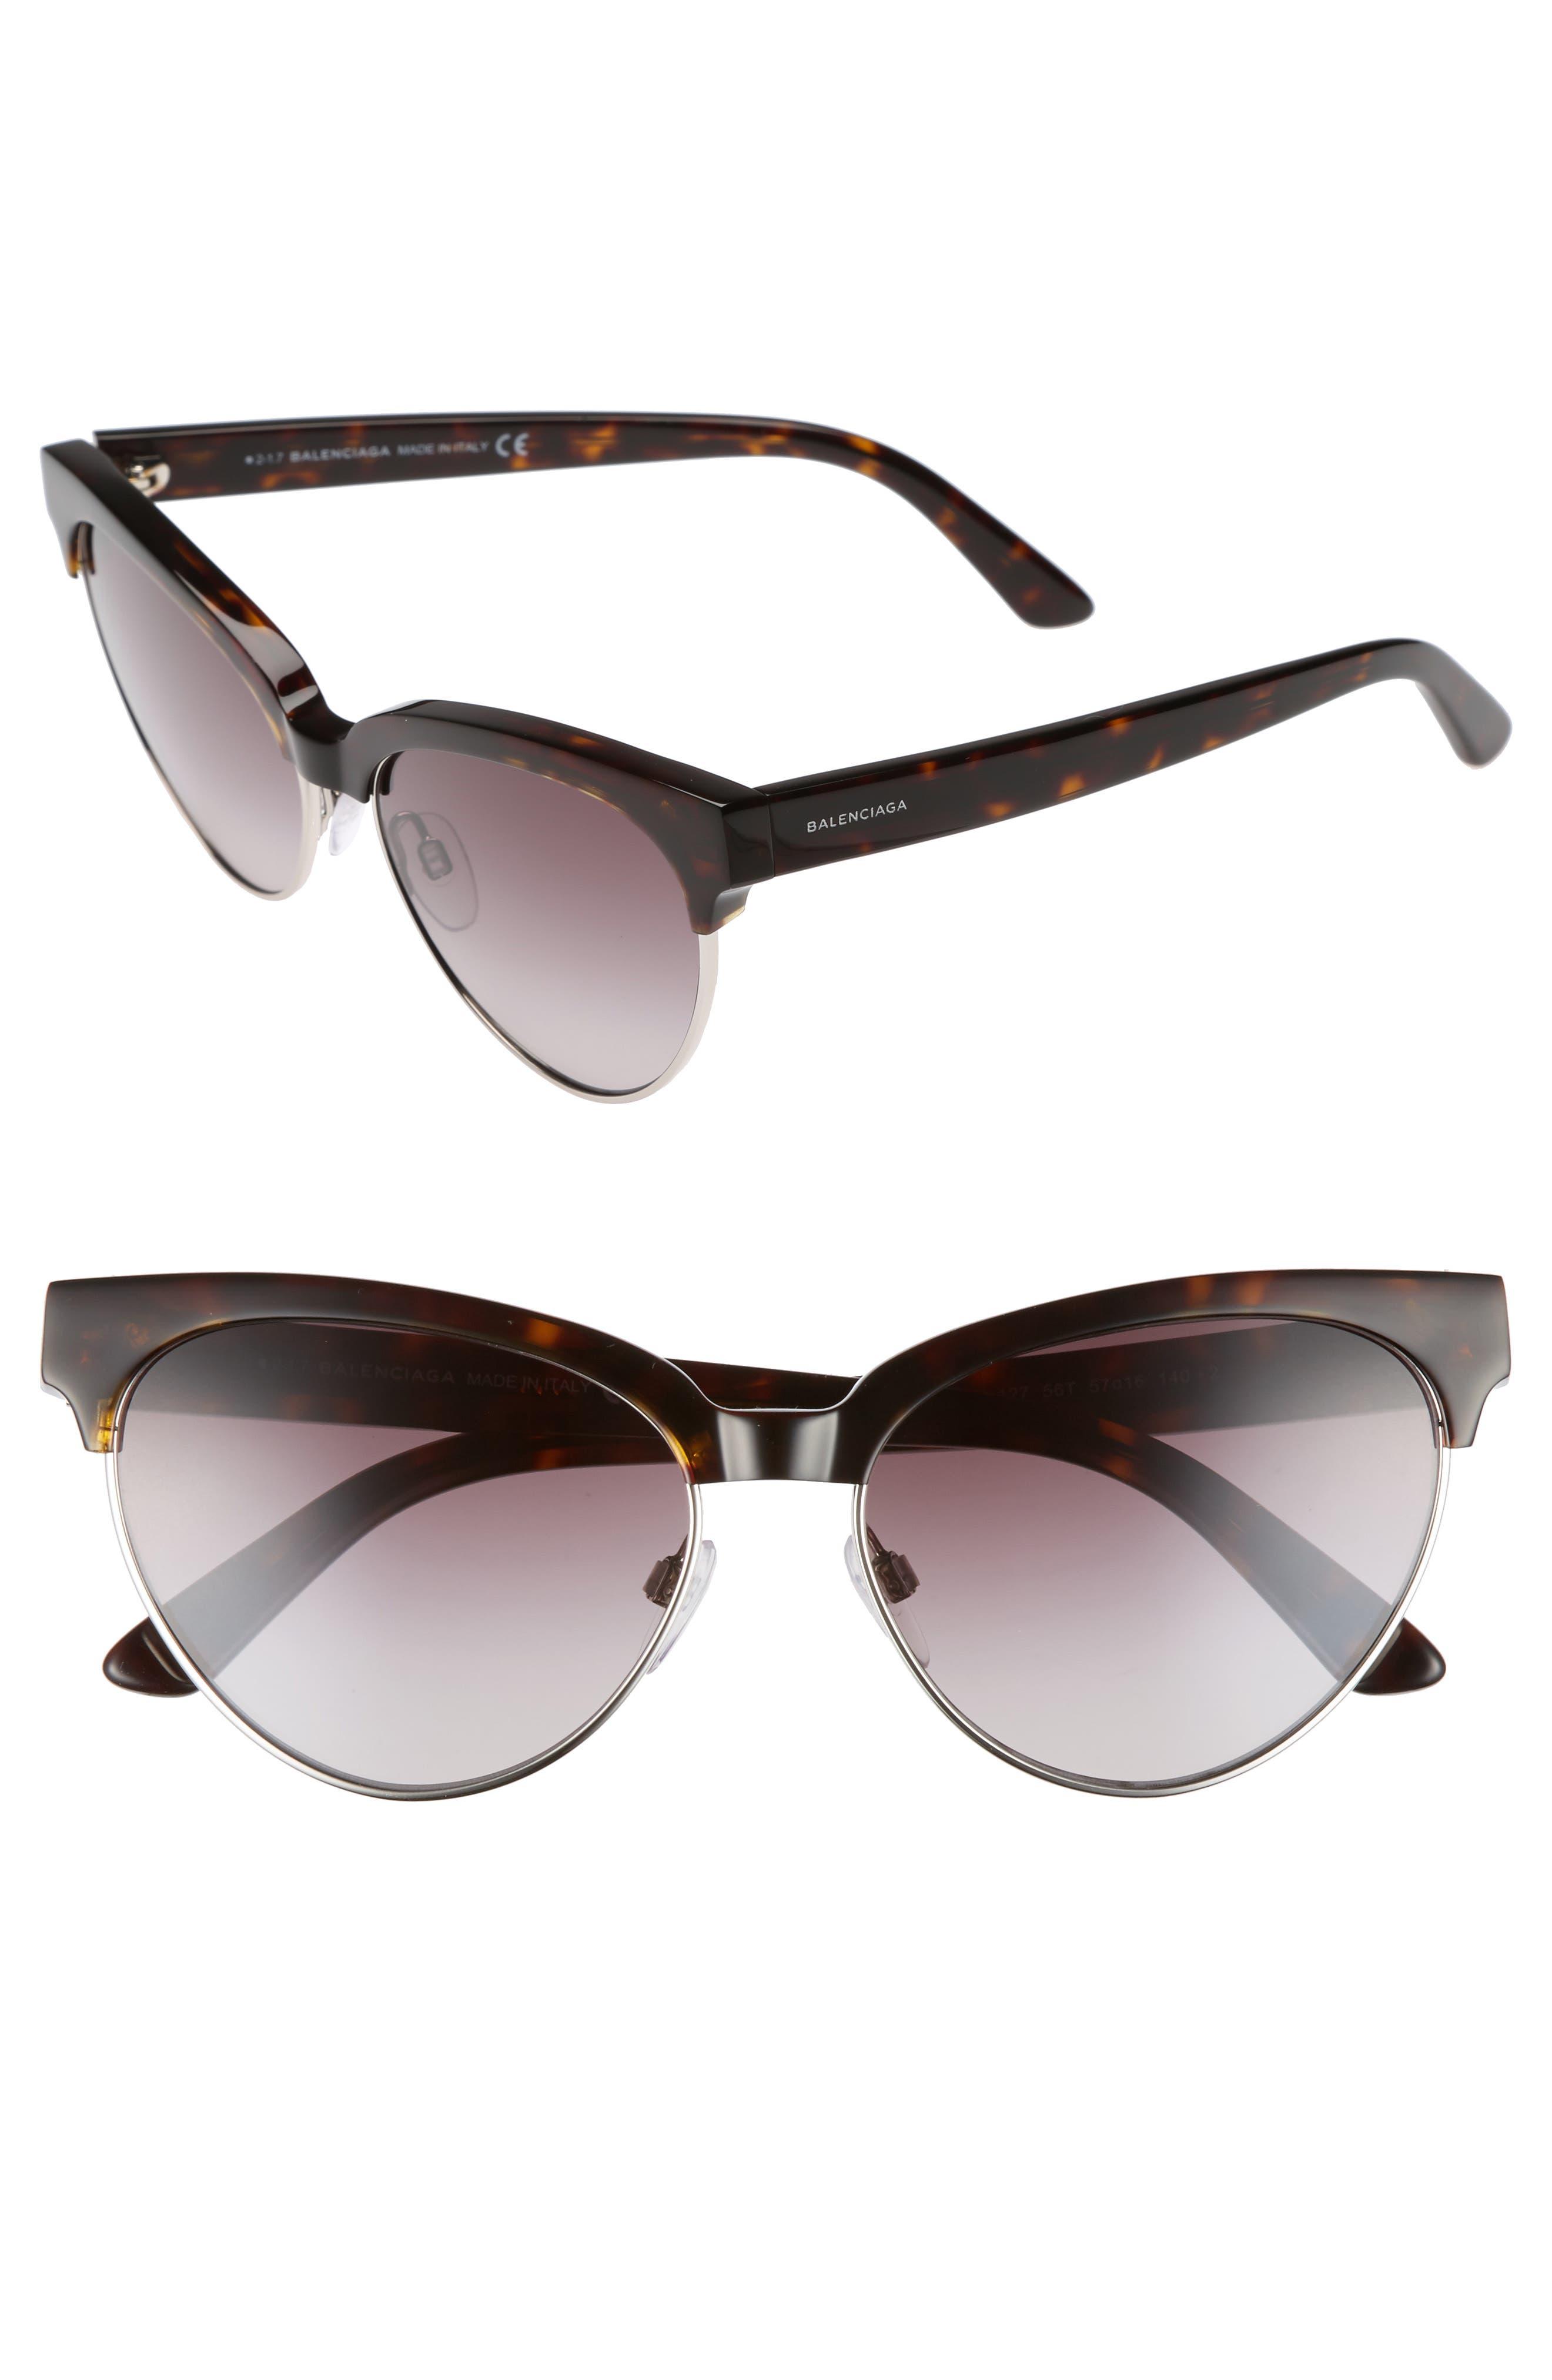 Alternate Image 1 Selected - Balenciaga 57mm Gradient Cat Eye Sunglasses